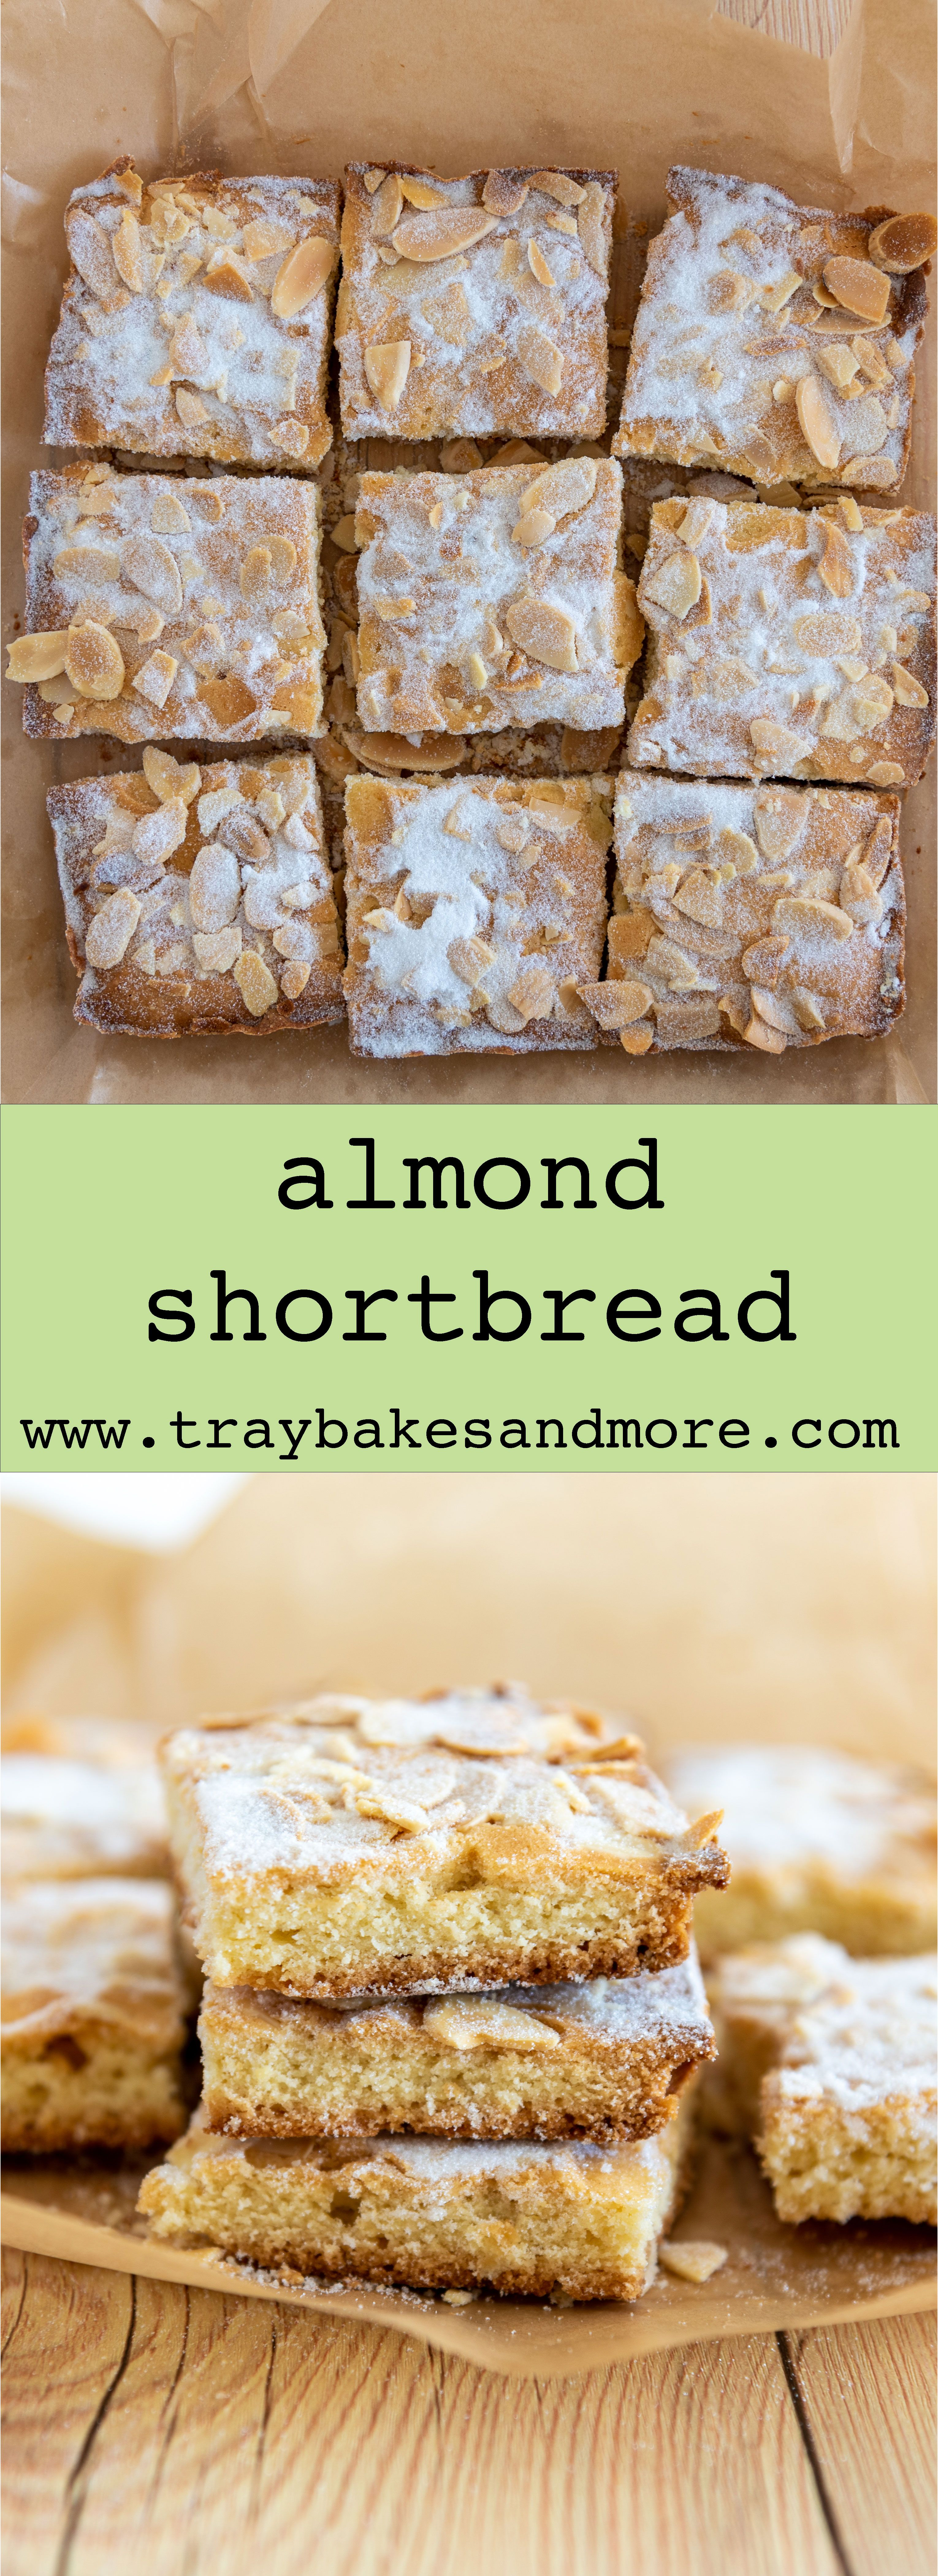 Almond Shortbread In 2021 Almond Recipes Baking Almond Recipes Biscuit Recipes Uk